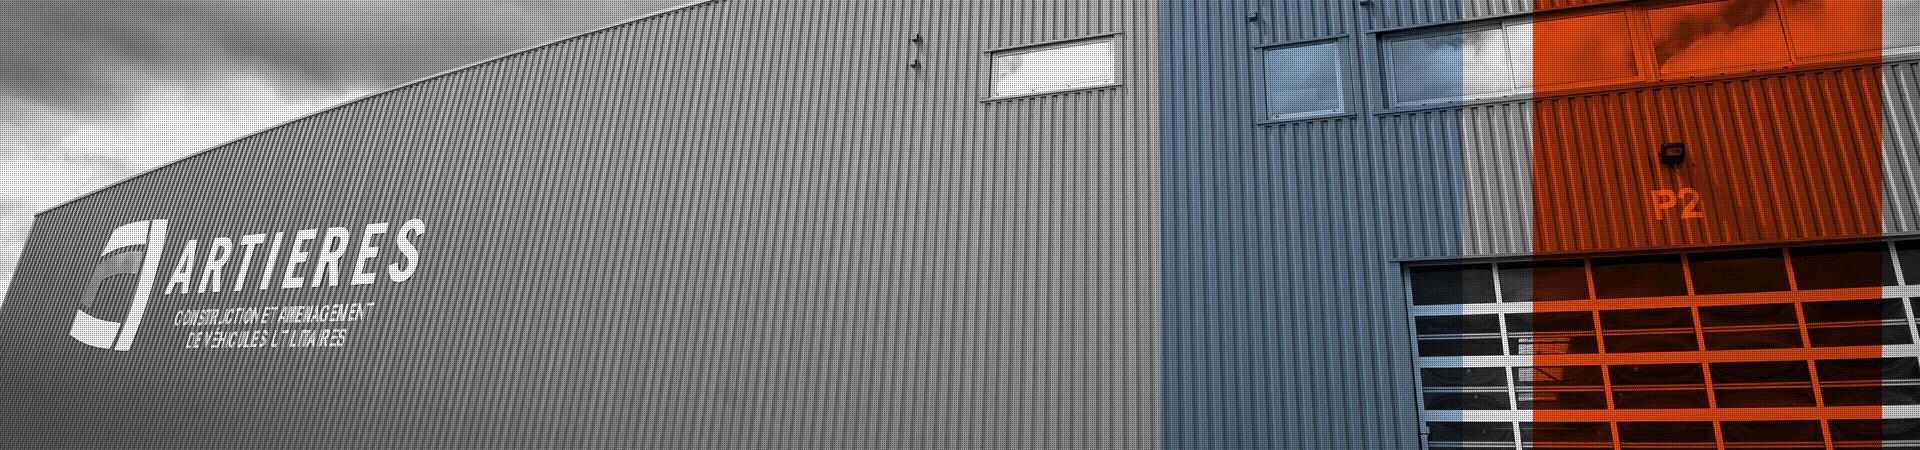 artieres carrosserie entrepise hangar